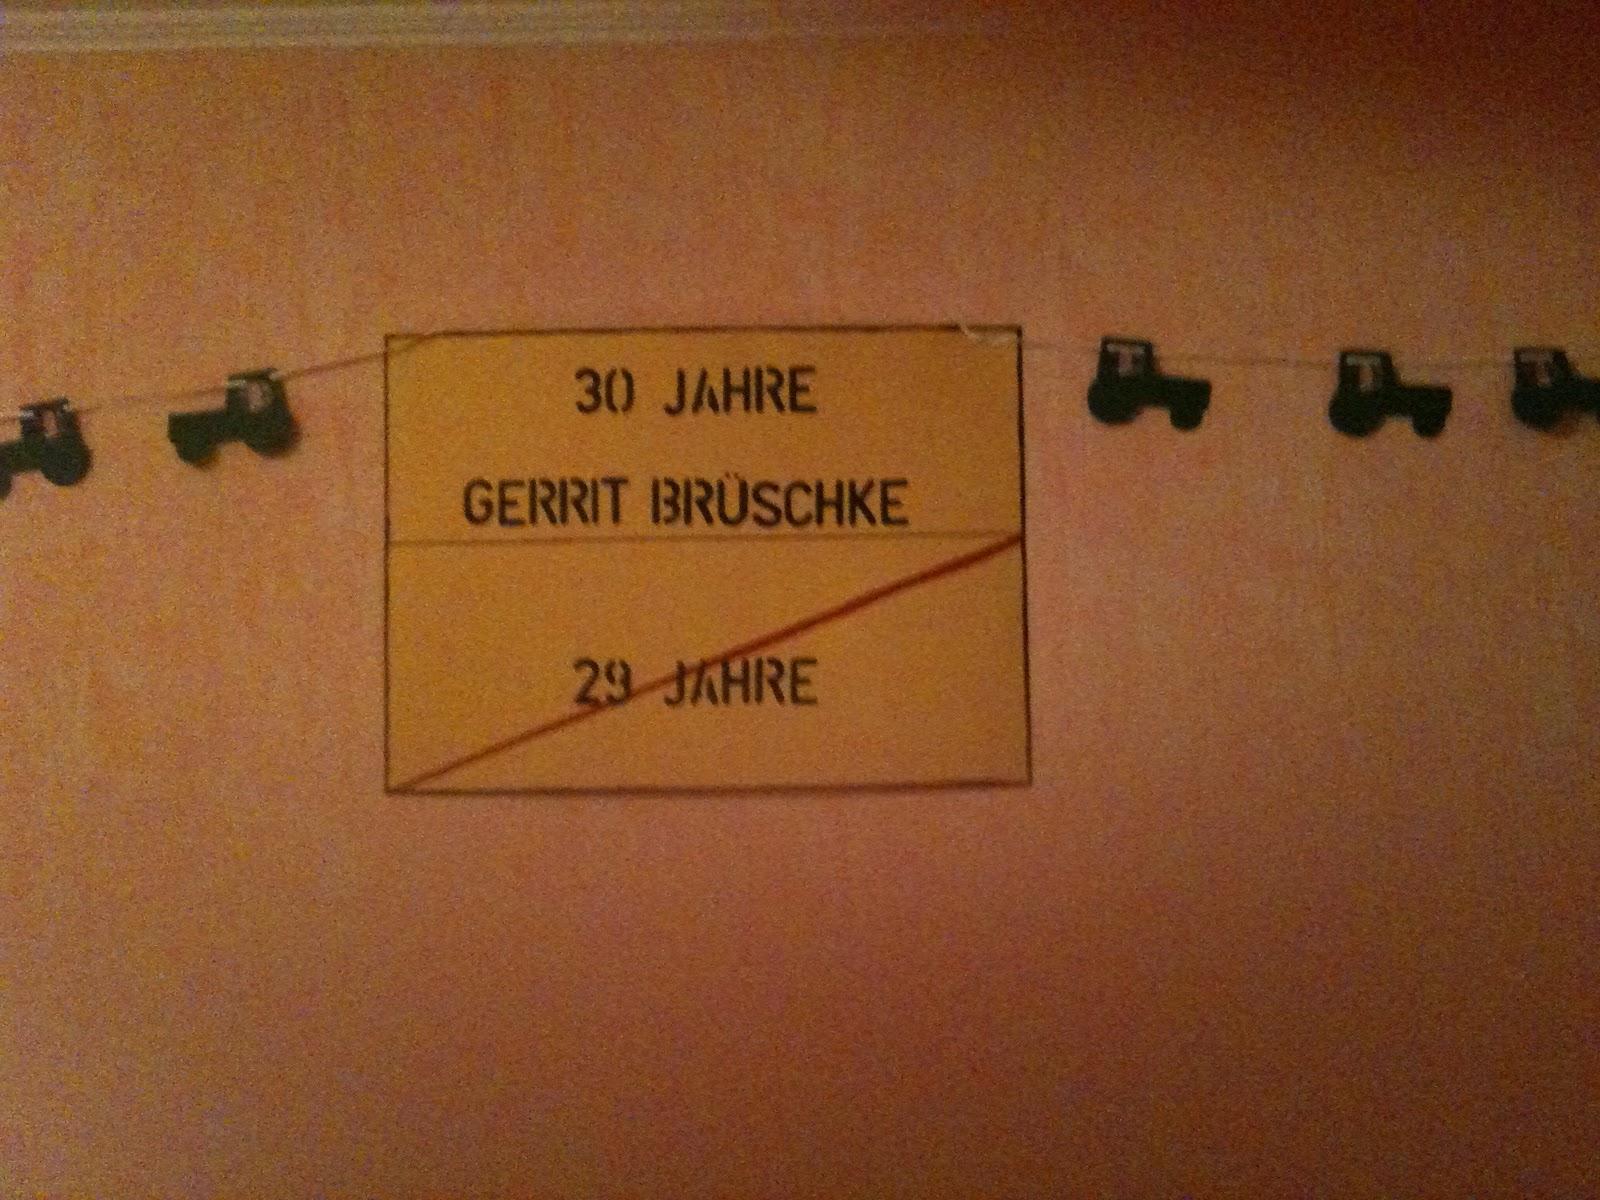 ... Garten Tags Deko Haus No Sieben Geburtstags ...